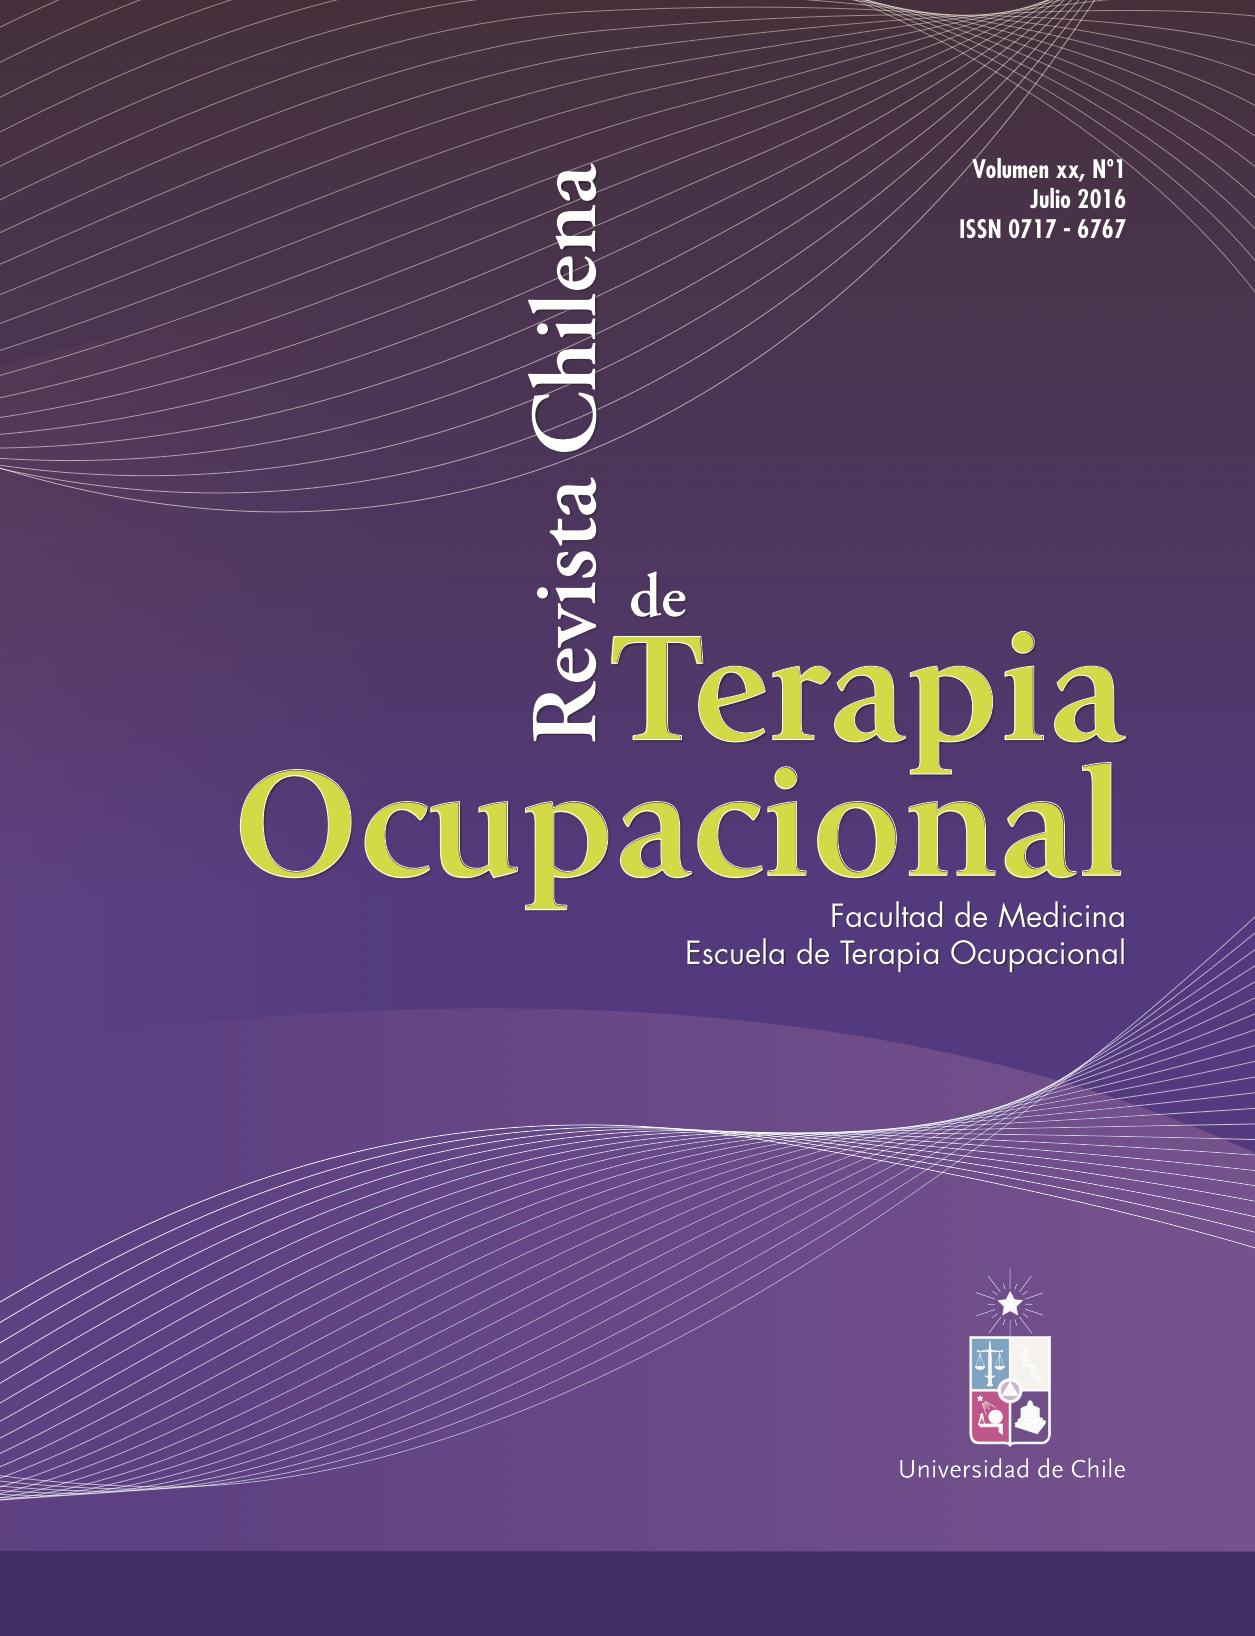 Revista Chilena de Terapia Ocupacional